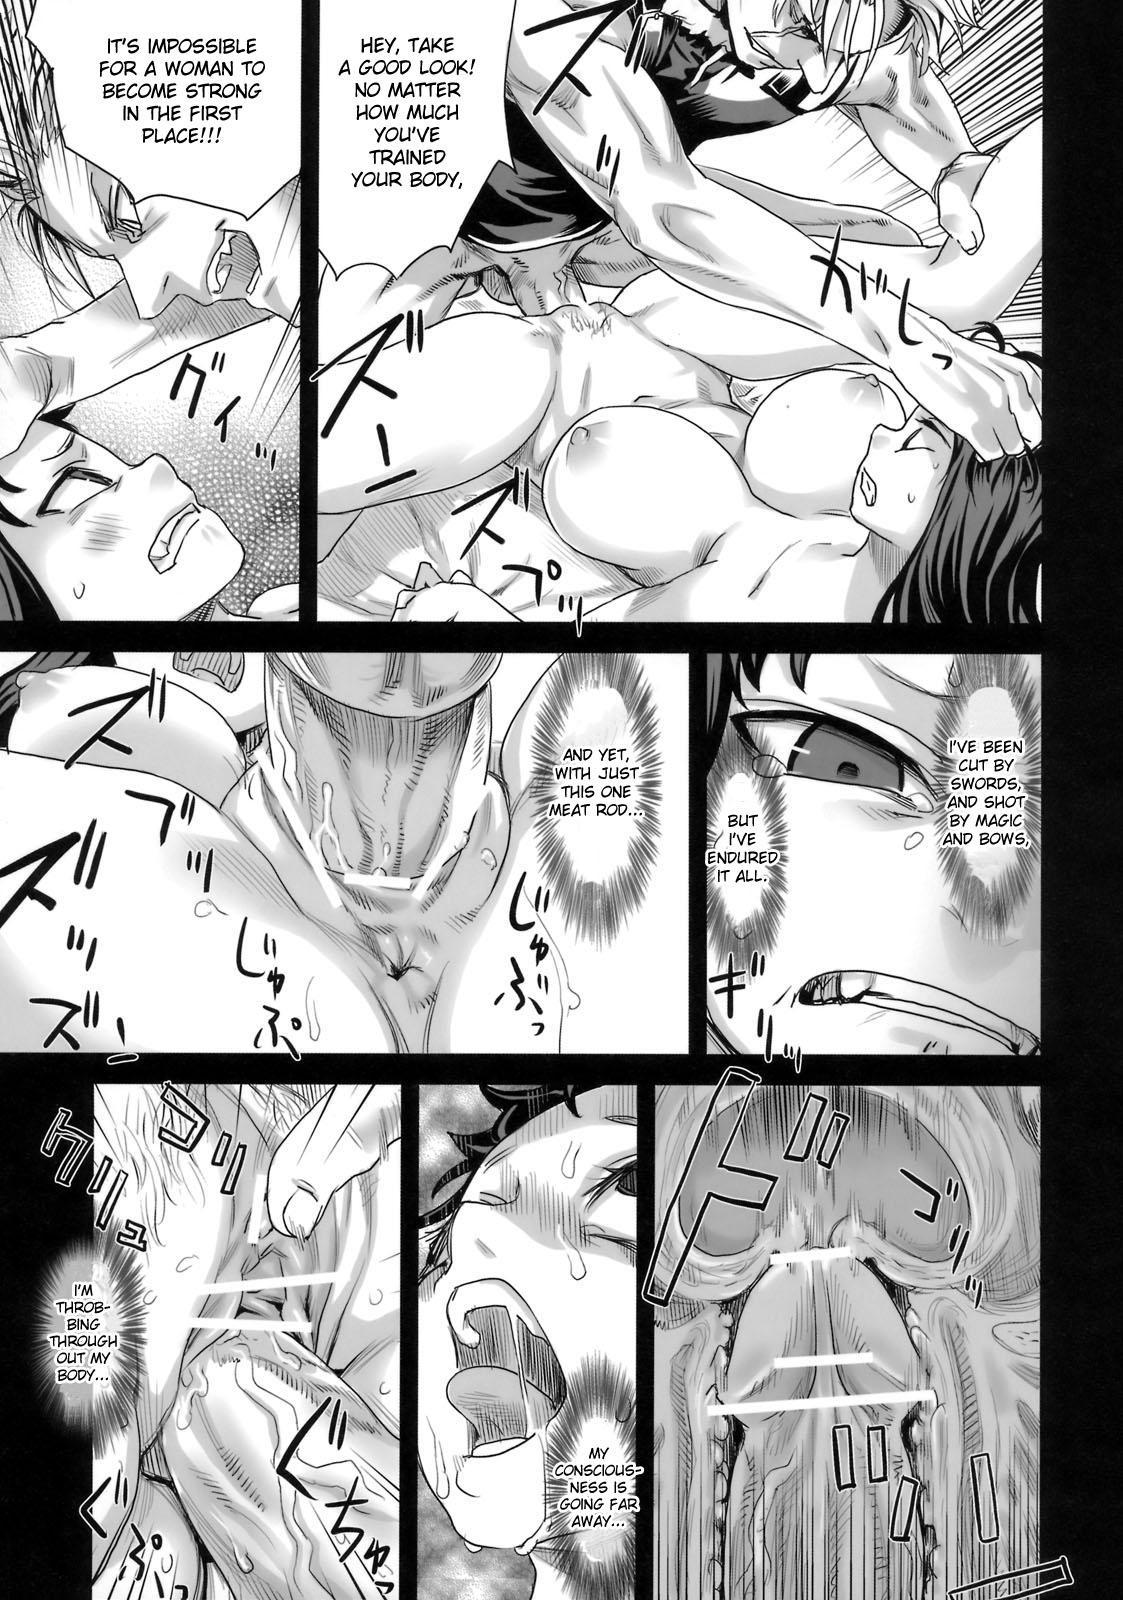 (C76) [Fatalpulse (Asanagi)] Victim Girls 7 - Jaku Niku Kyoushoku Dog-eat-Bitch (Fantasy Earth Zero) [English] [desudesu] 17